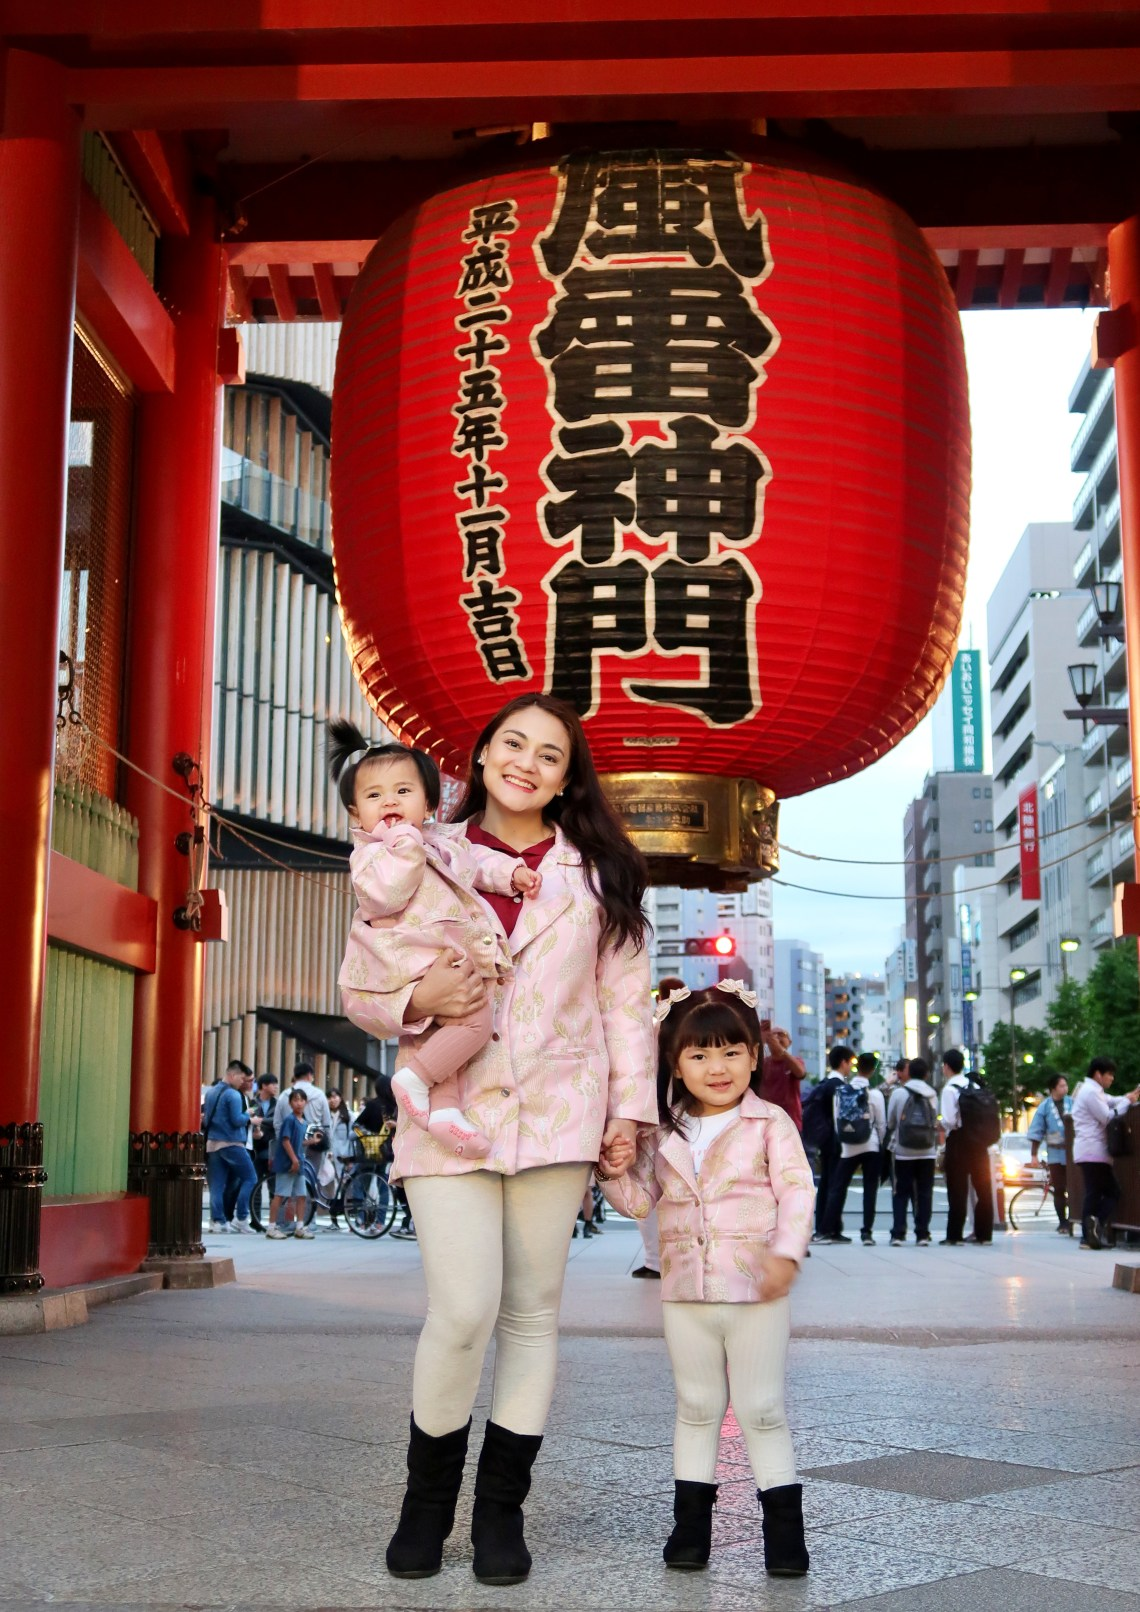 dyosathemomma: Kids get their intelligence from mom, mommy blogger, MariaAmariaMariana